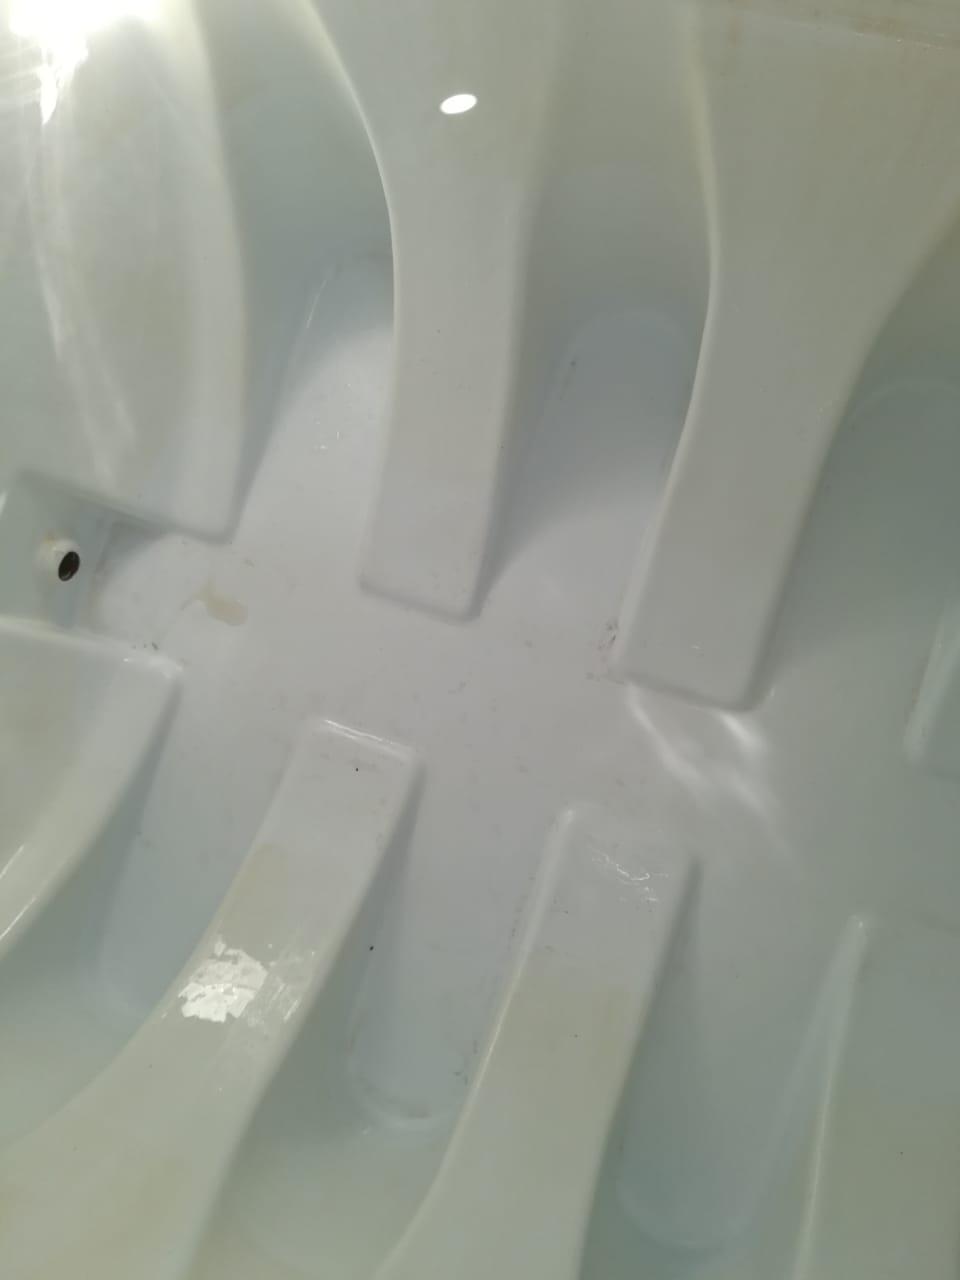 شركه تنظيف خزانات برأس تنوره